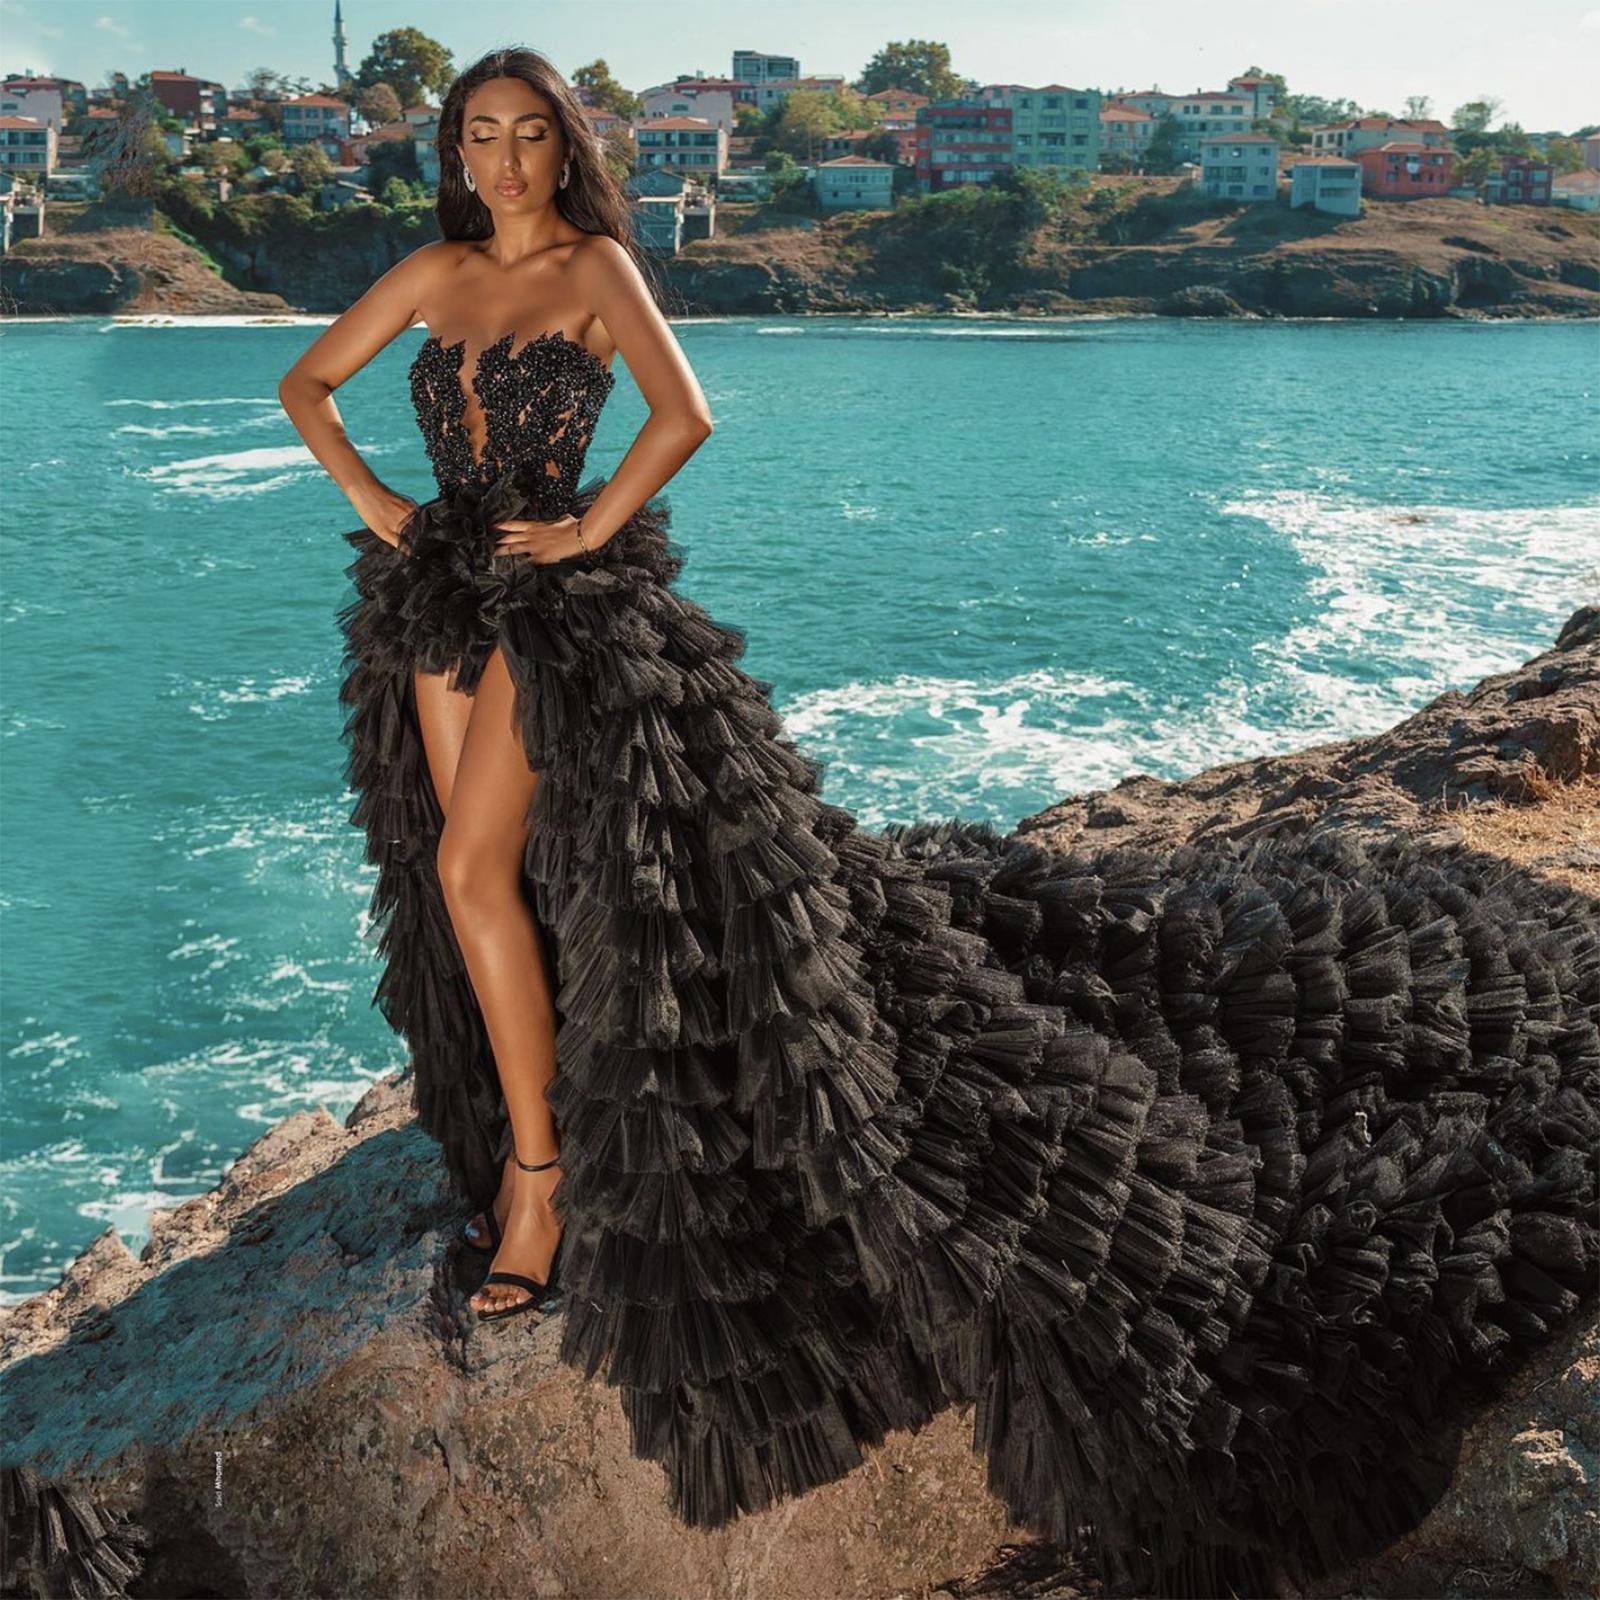 Vestidos de novia Bohemian Hippie Black 2021 Playa A-Line Vestido de novia Boda Vestidos nupciales sin tirantes Tul Tulle Boho Hi-Lo Sexy Tiers